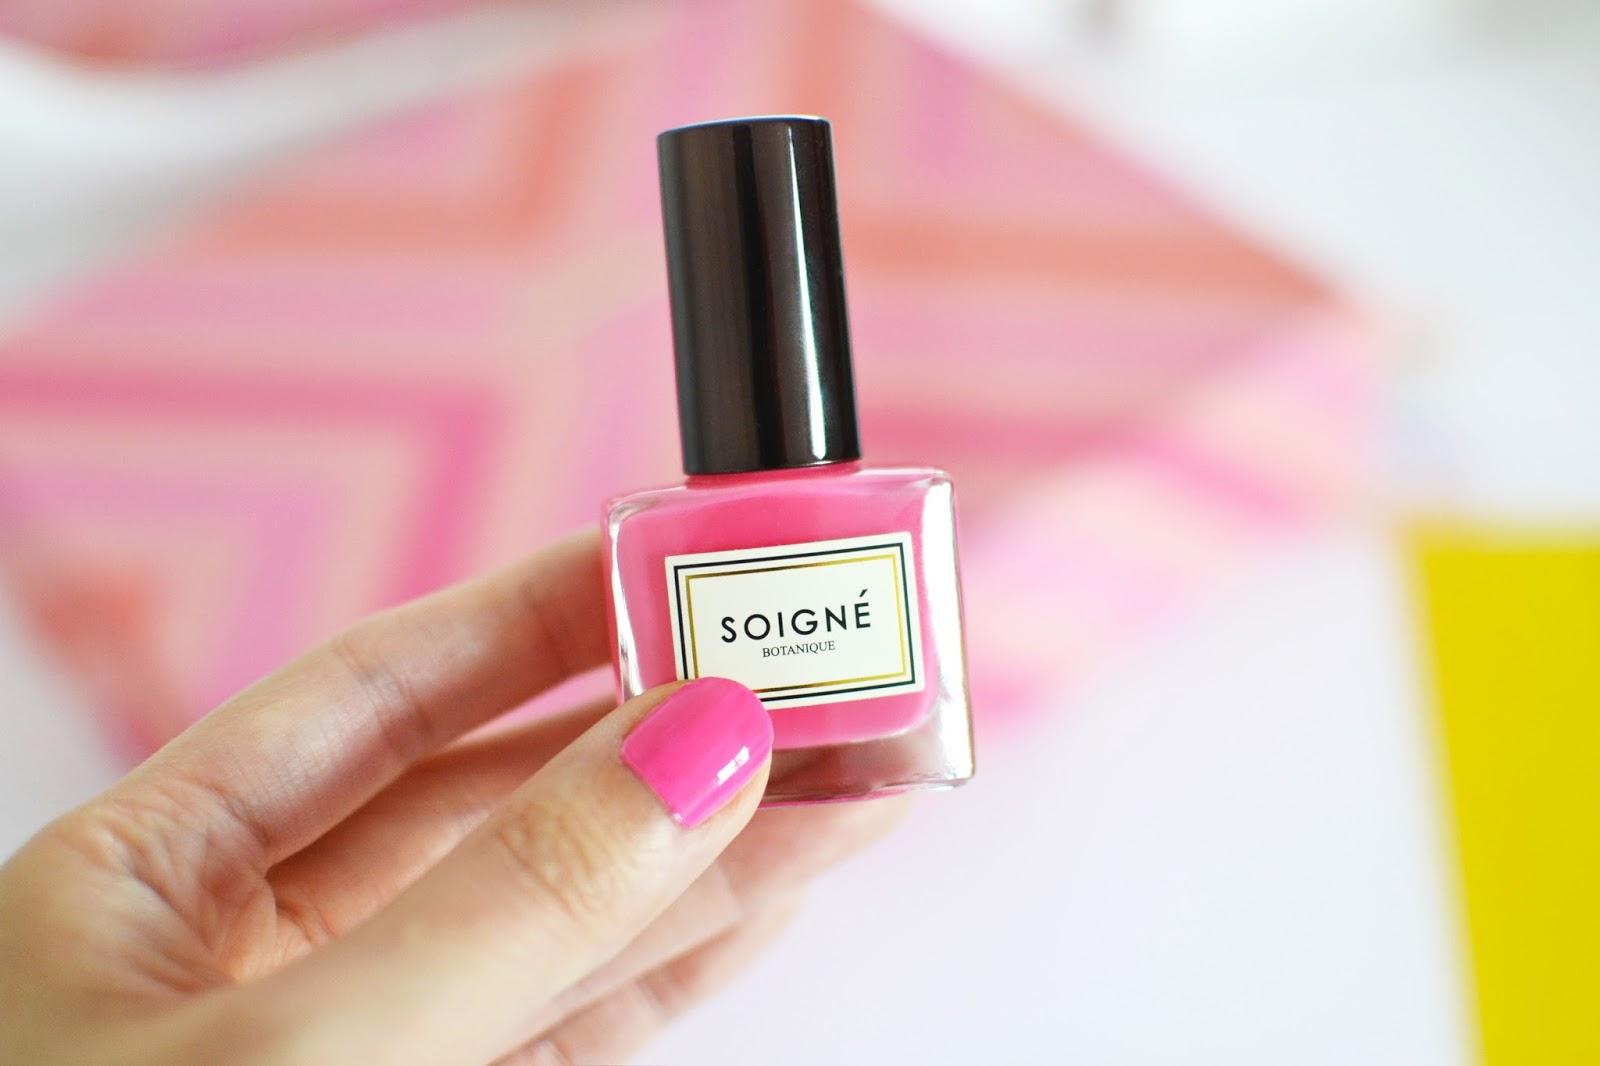 soigne pink nail polish